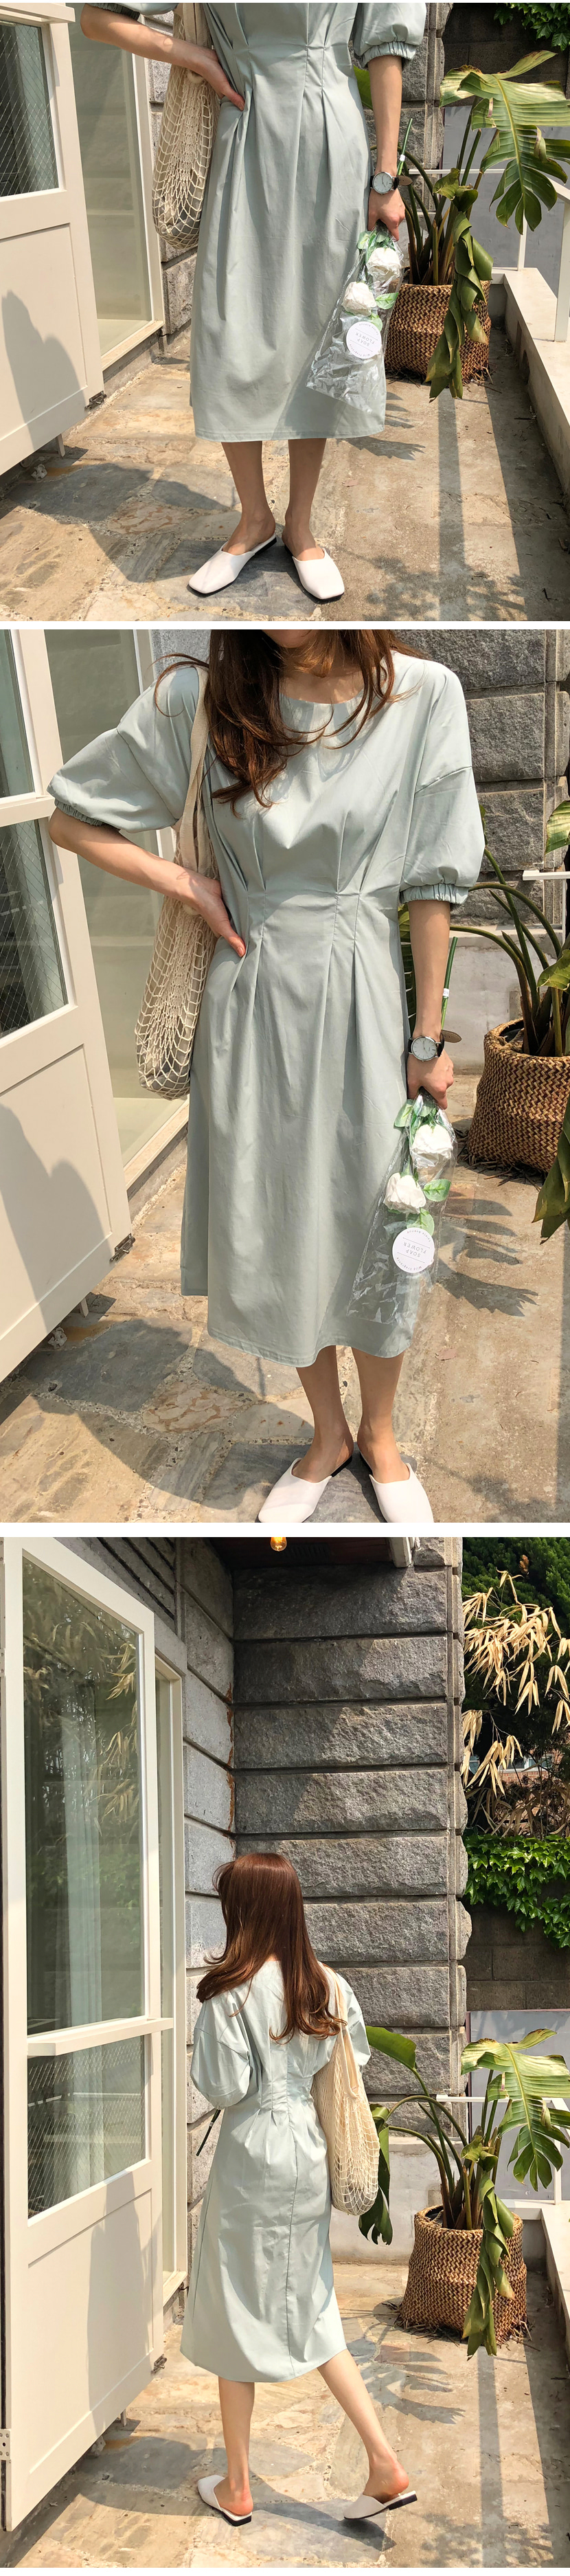 Finch Puff Dress